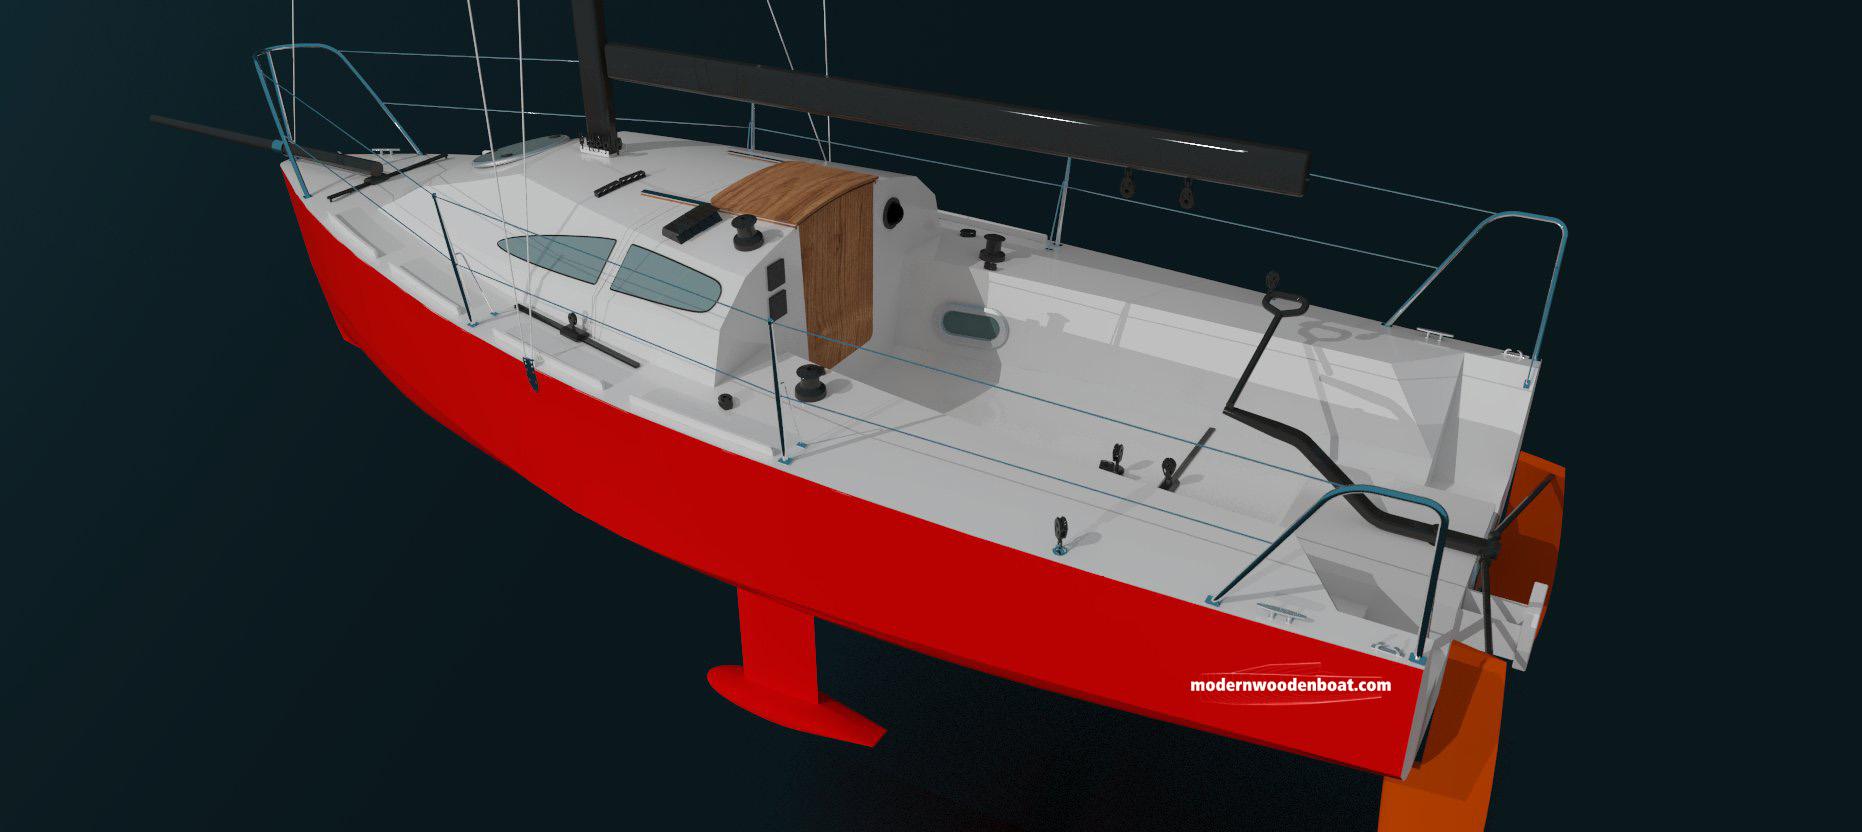 idea-21-radiuschine-epoxy-plywood-sportboat-02